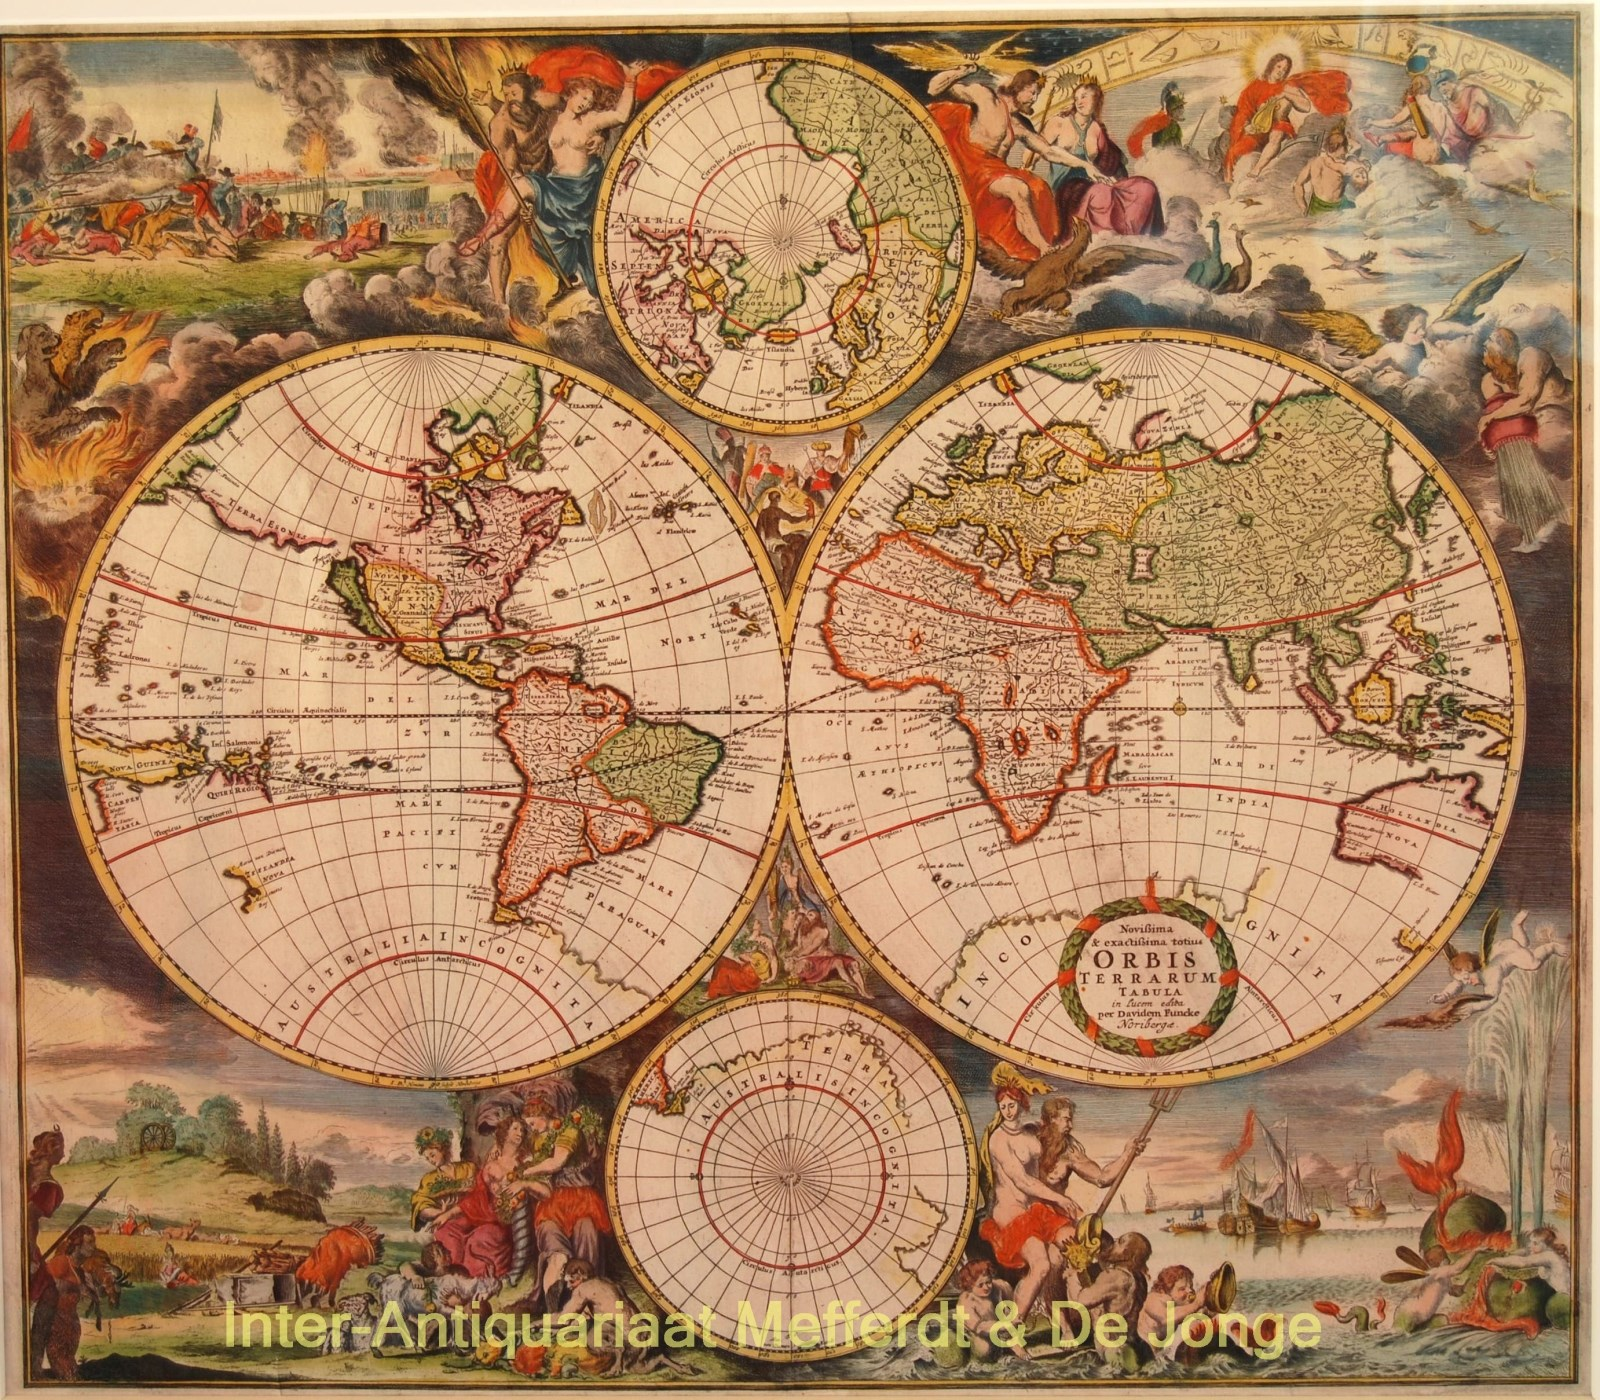 FUNCKE,  DAVID - World map - Romein de Hooghe, David Funcke, c. 1700